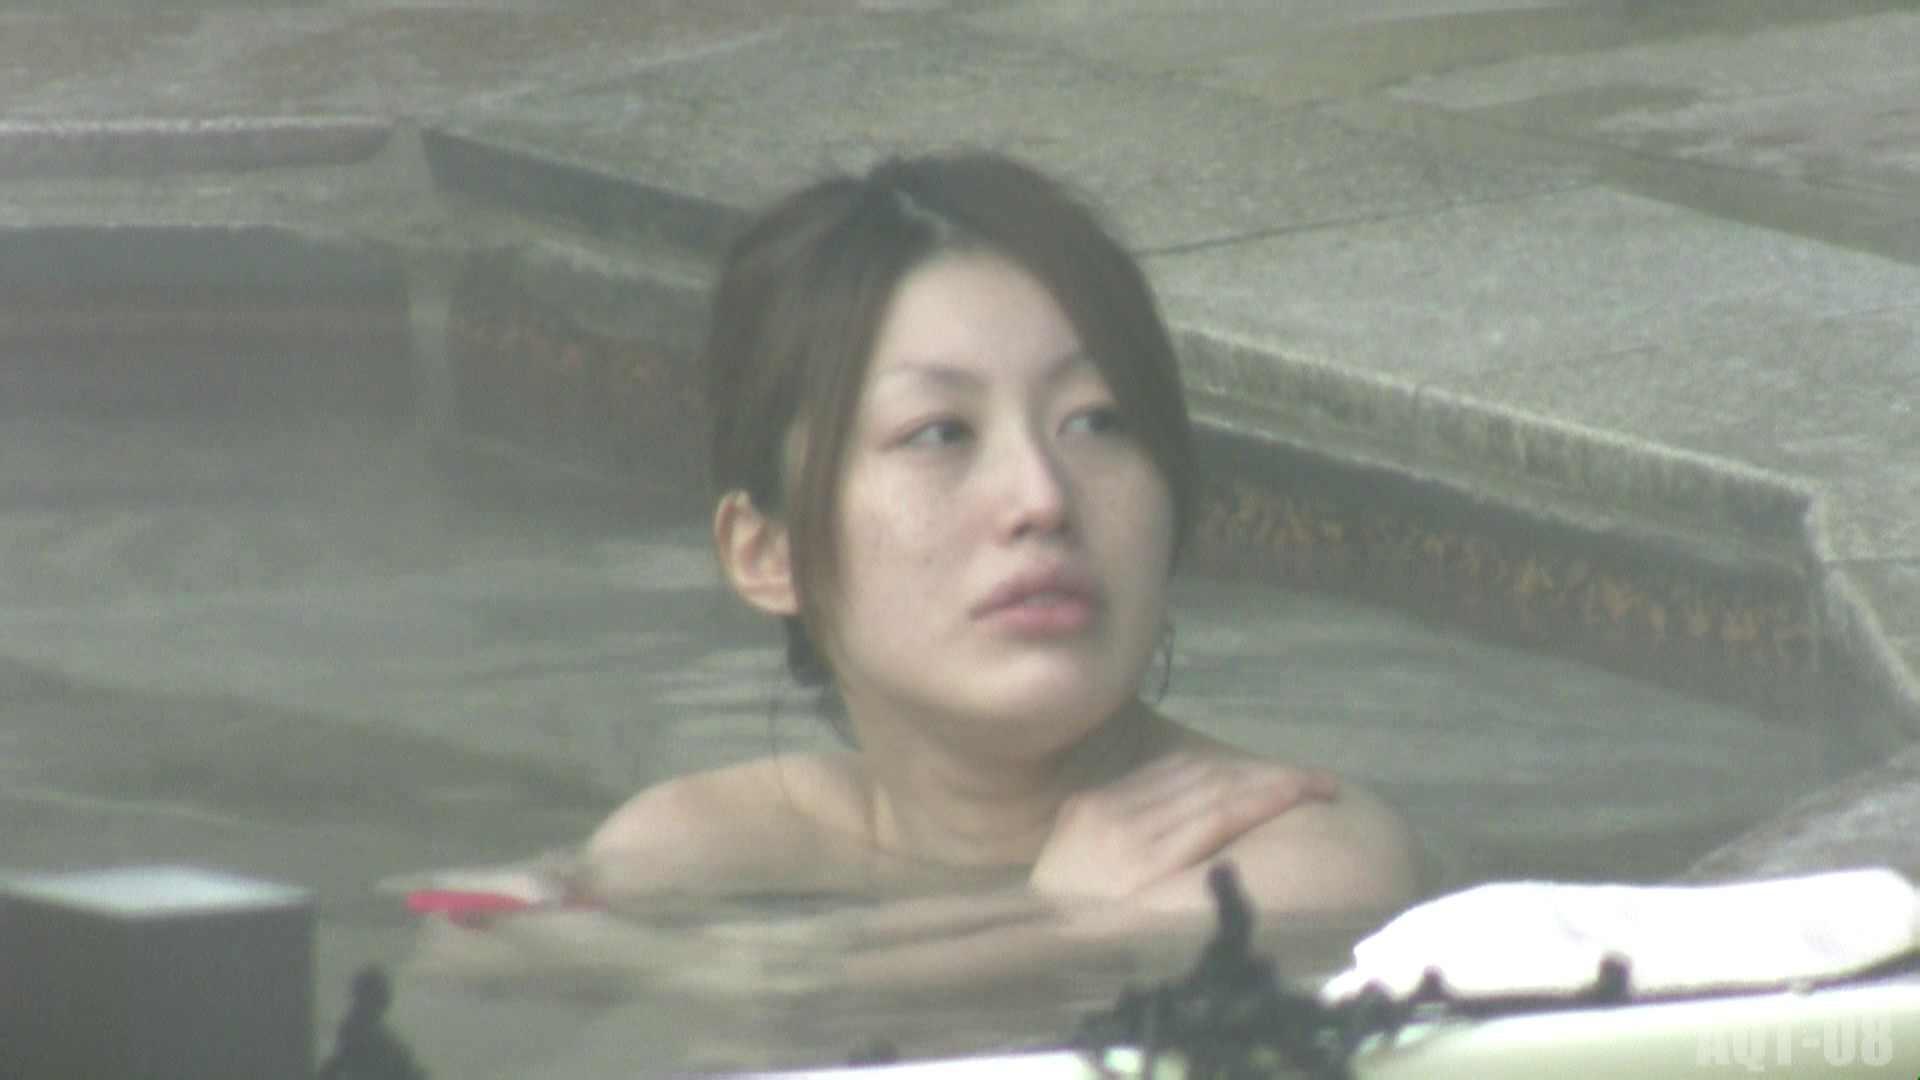 Aquaな露天風呂Vol.775 盗撮師作品 AV無料動画キャプチャ 98pic 32